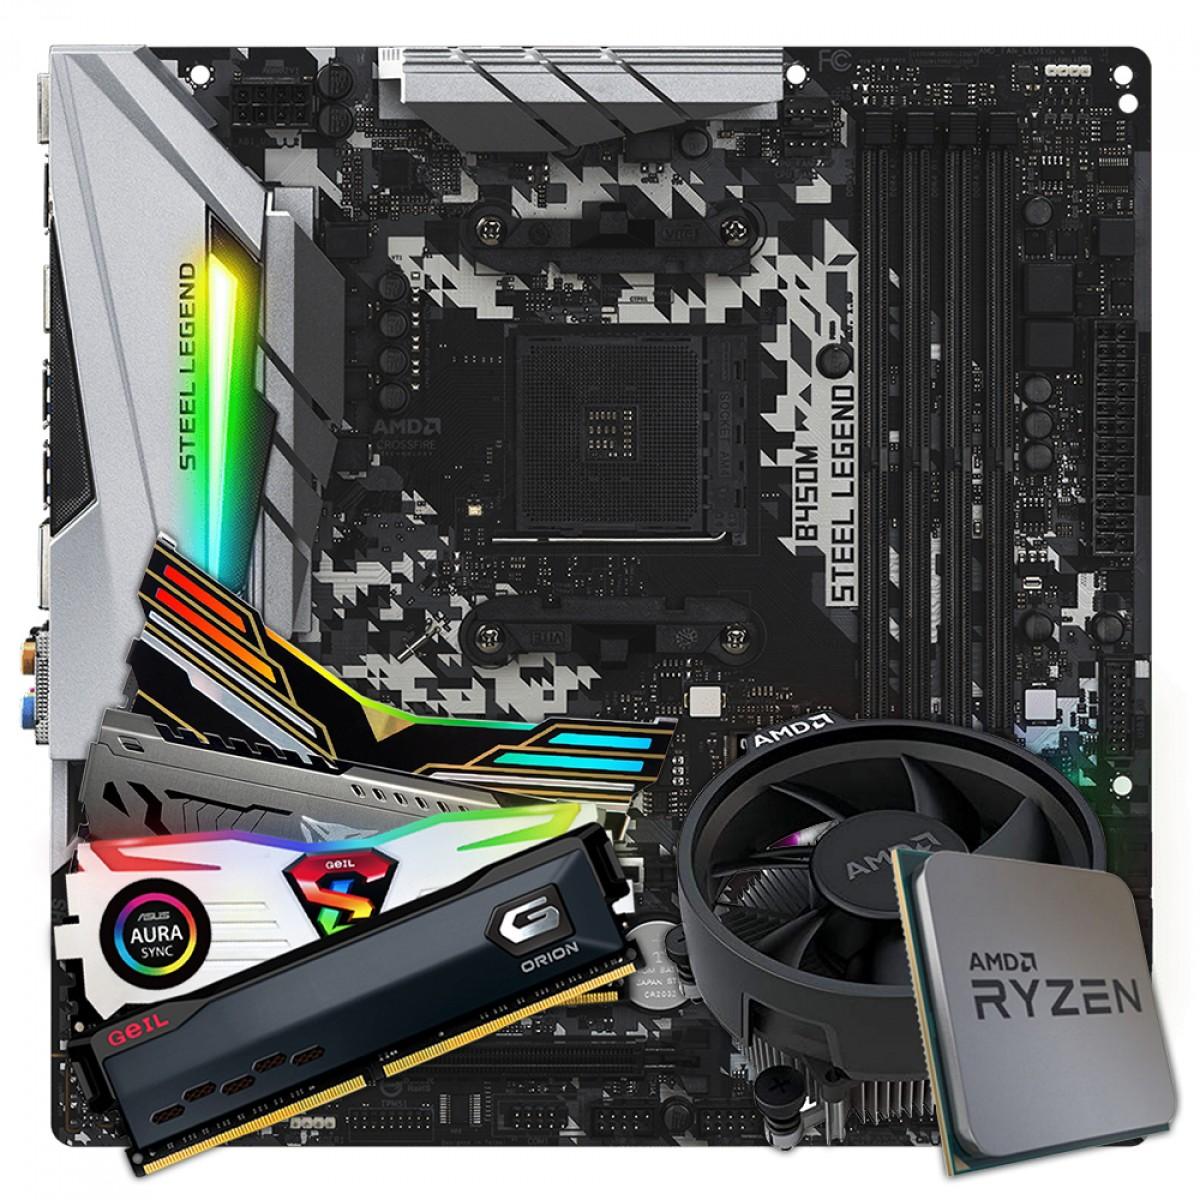 Kit Upgrade Placa Mãe ASRock B450M Steel Legend + Processador AMD Ryzen 5 3400G 3.7GHz + Memória DDR4 8GB 3000MHz